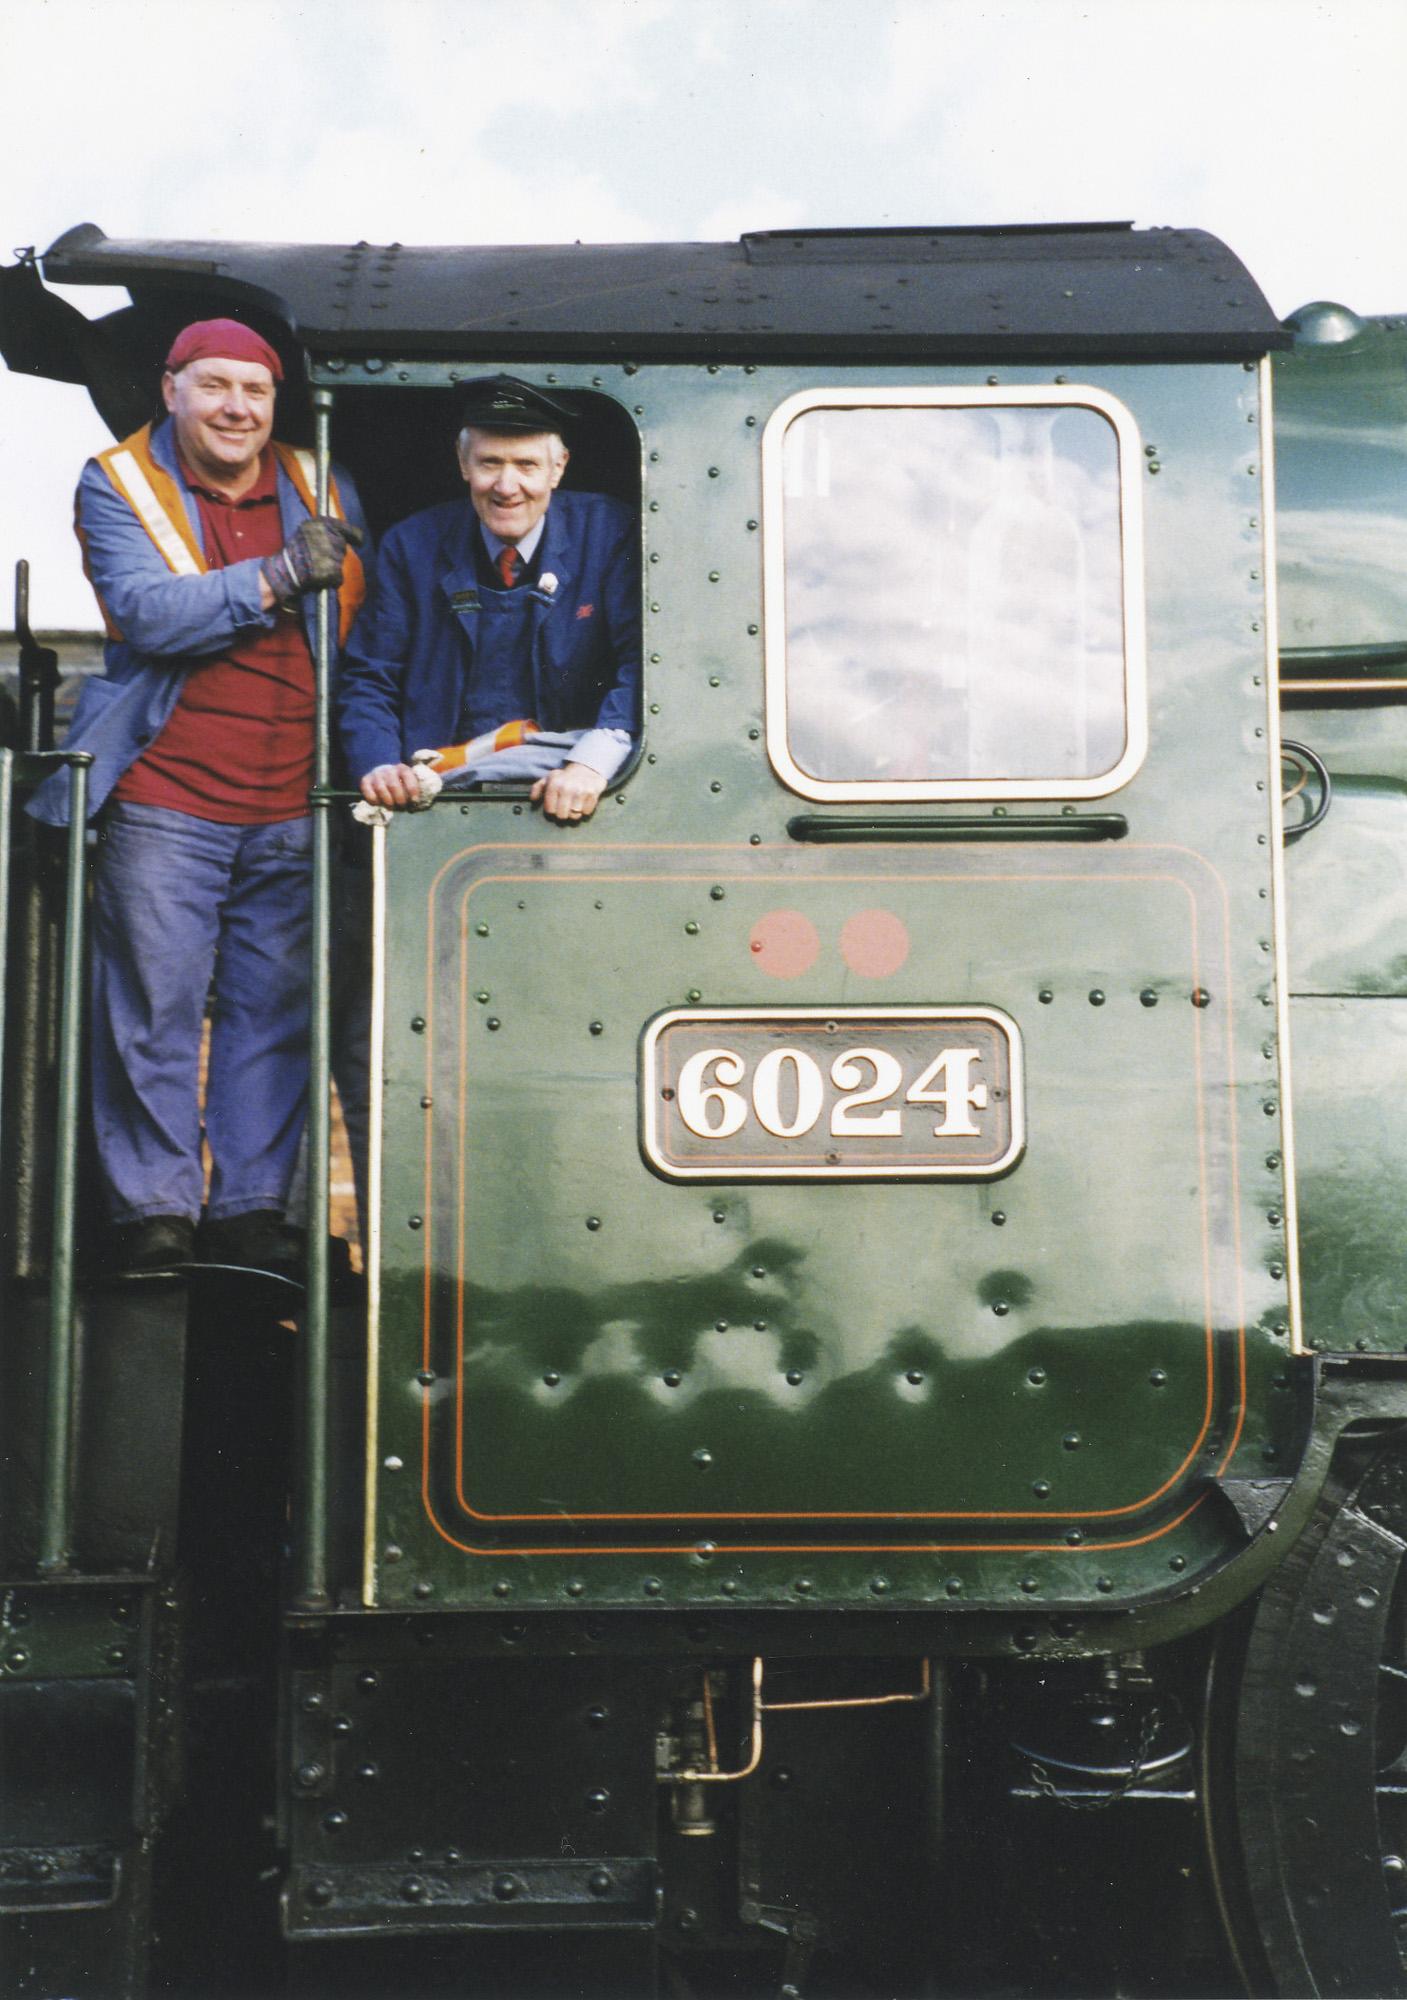 Paul Kane and Gordon Hodgson. © Bob Robson/6024PS Ltd